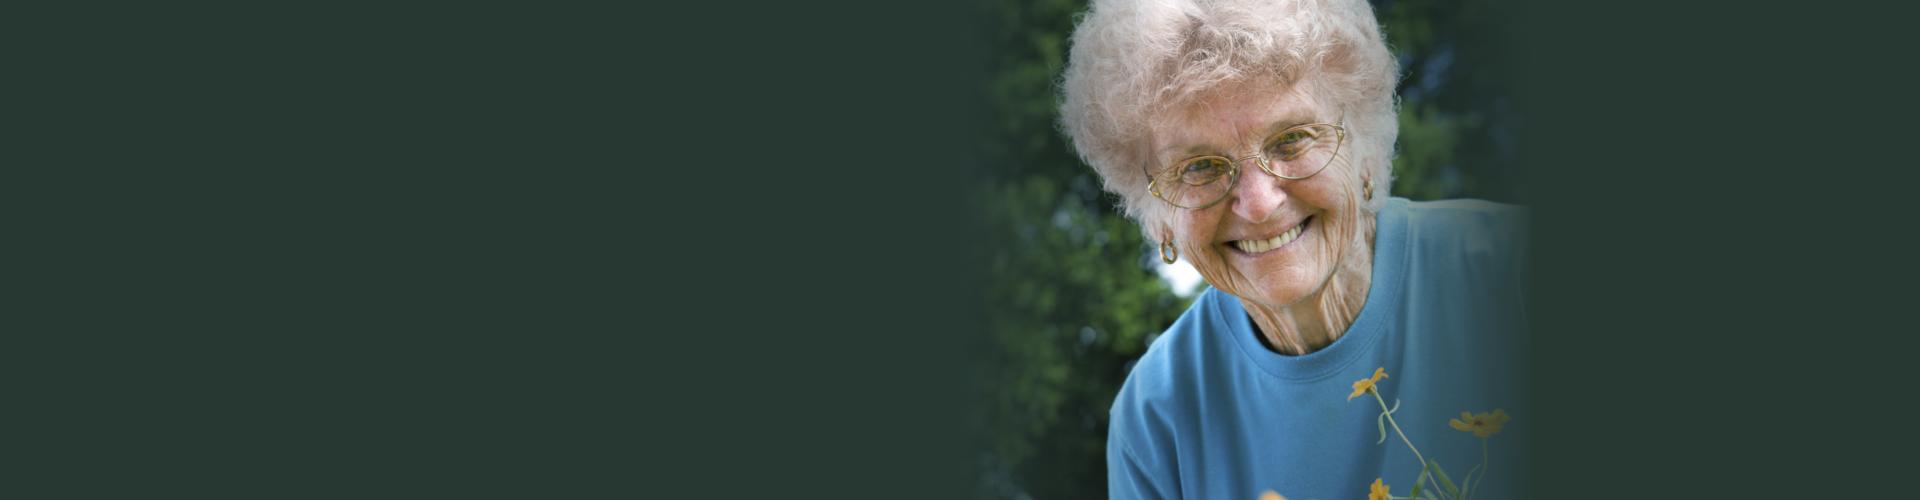 Female elder wearing blue shirt smiling